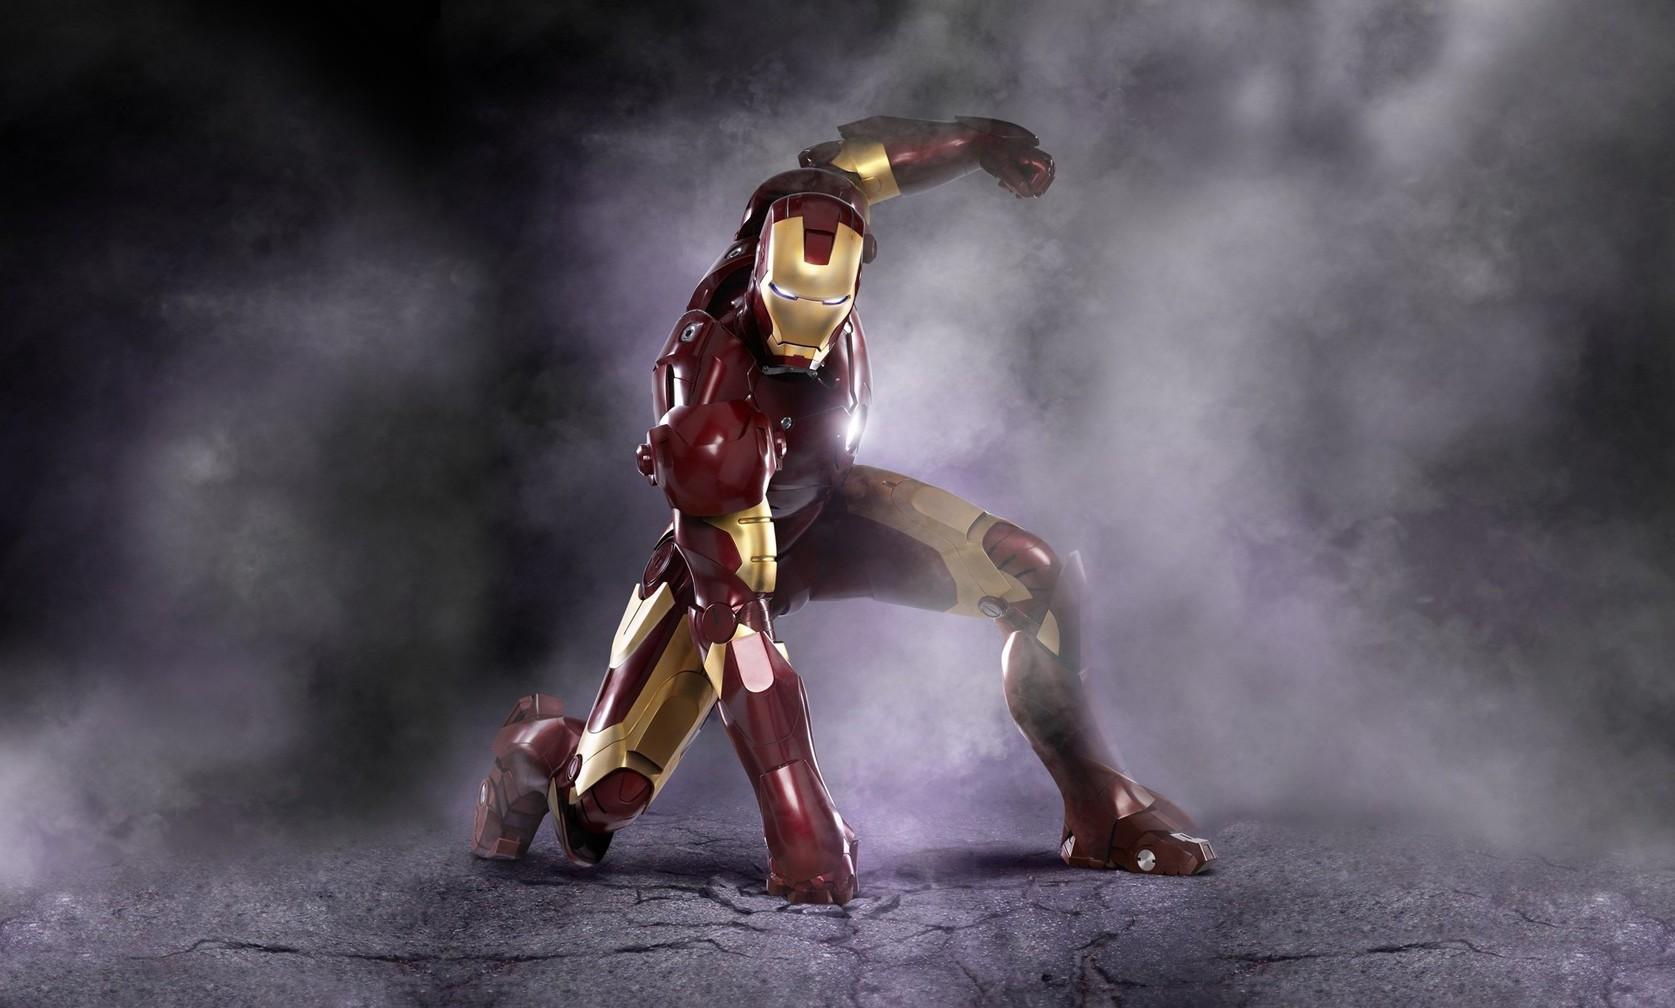 iron man 3 su enemigo posiblemente seria namor play reactor